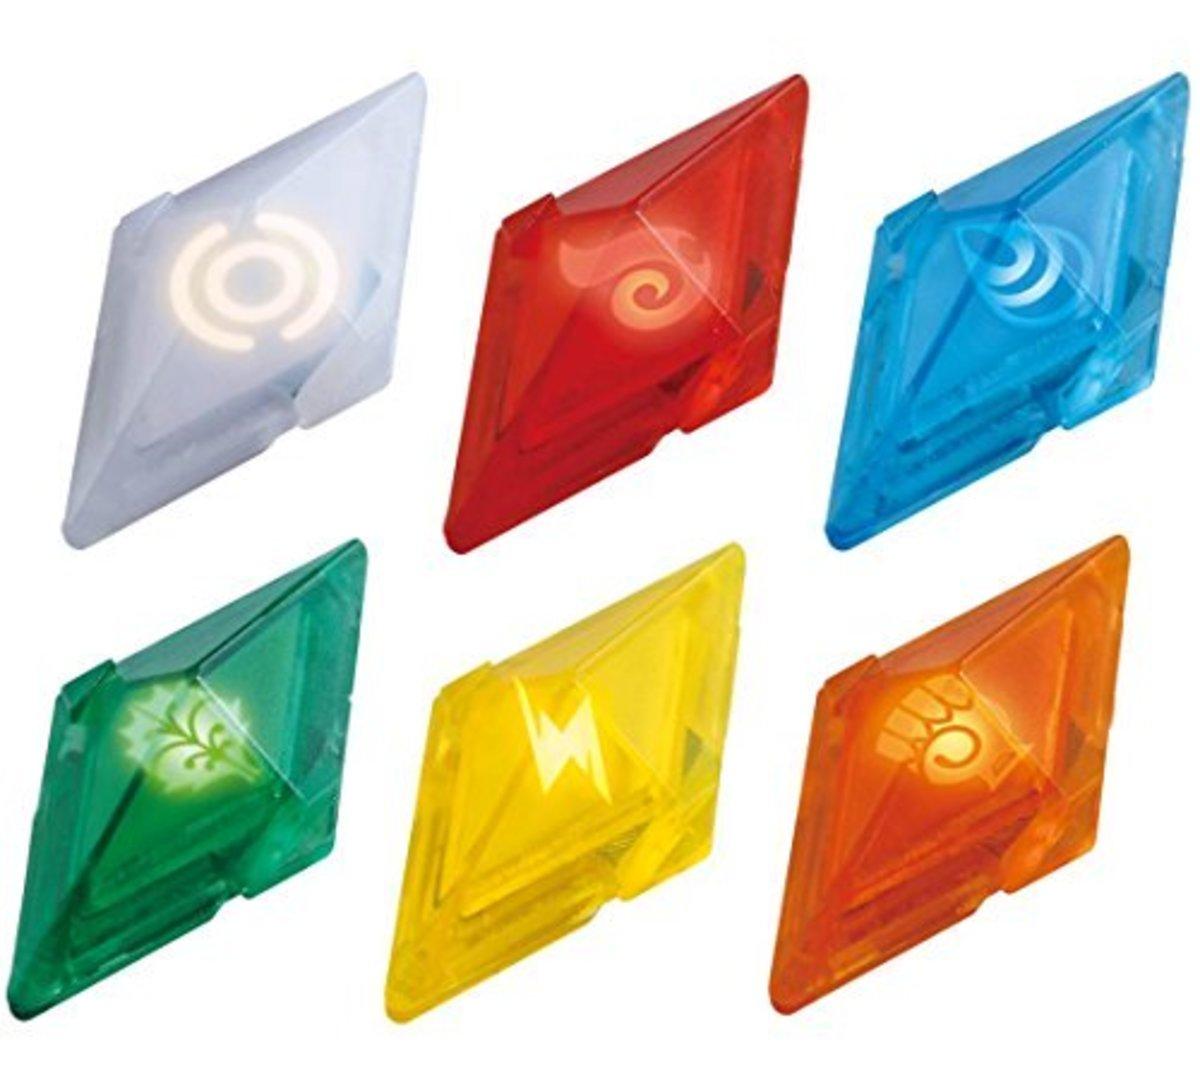 Several Z-Crystals